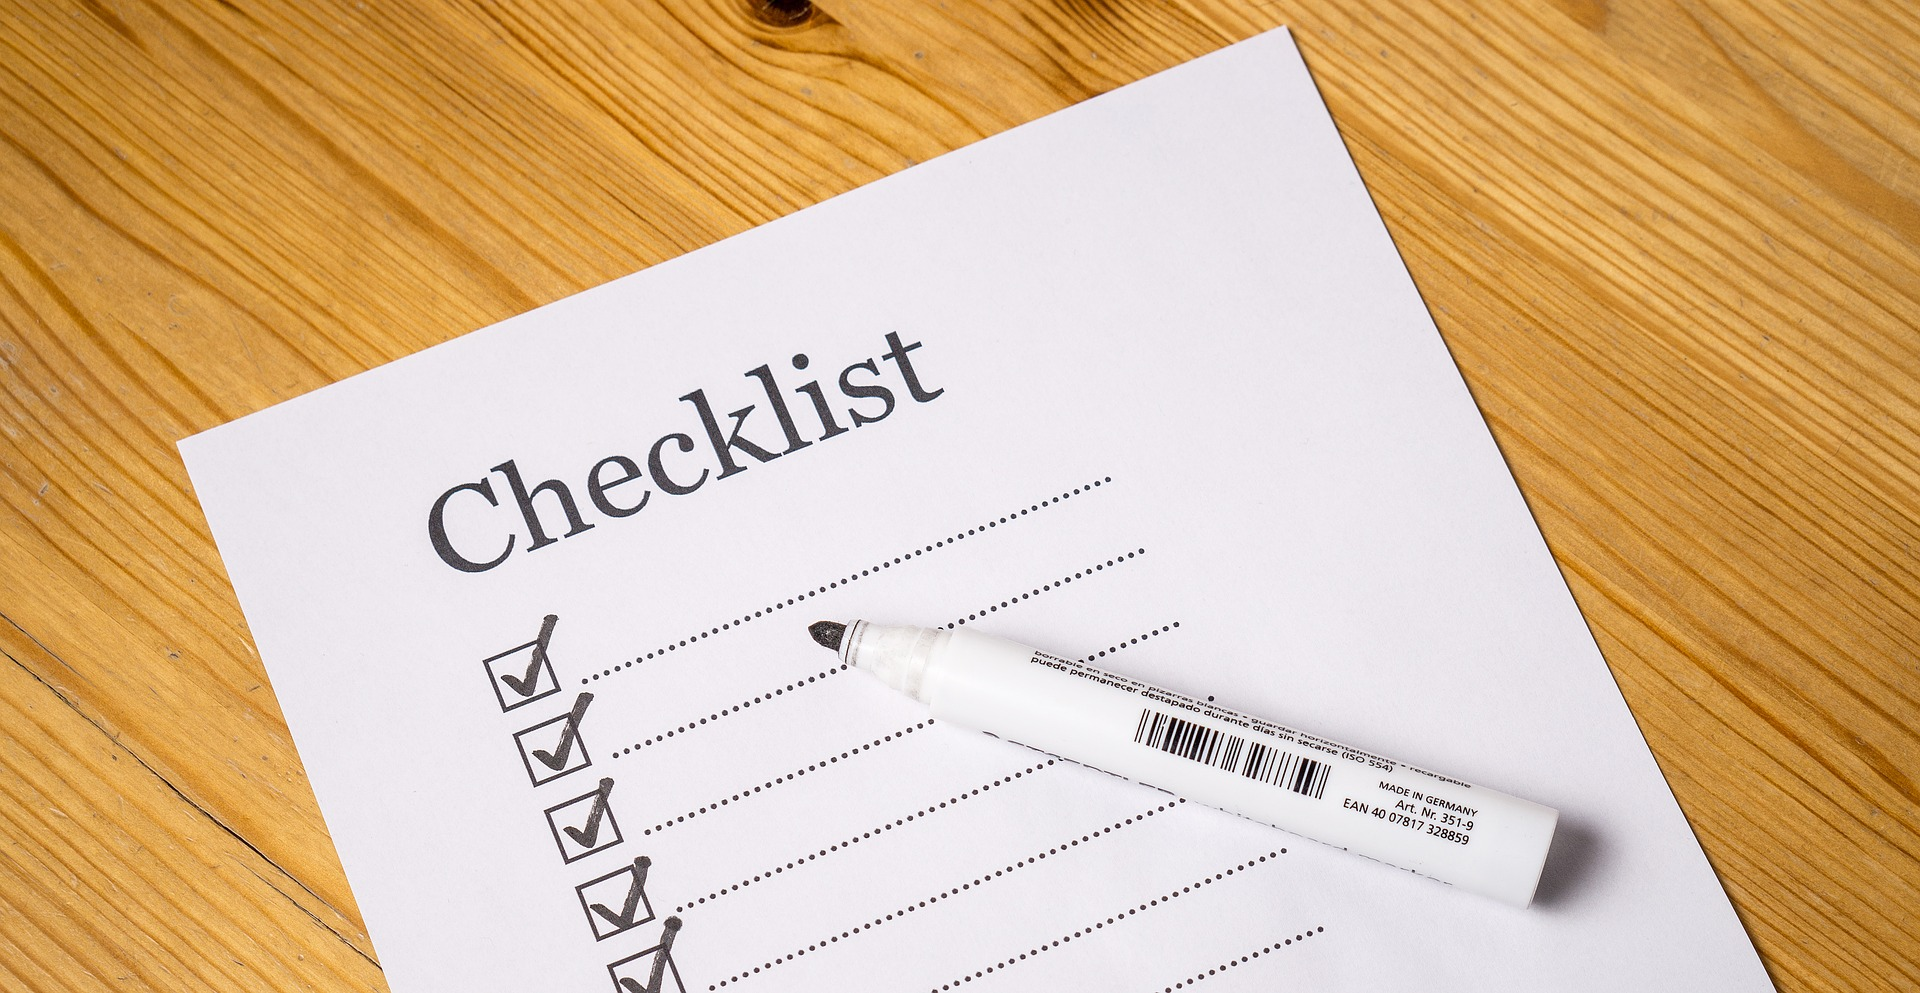 130 checklist for spouse i 130 checklist for spouse falaconquin